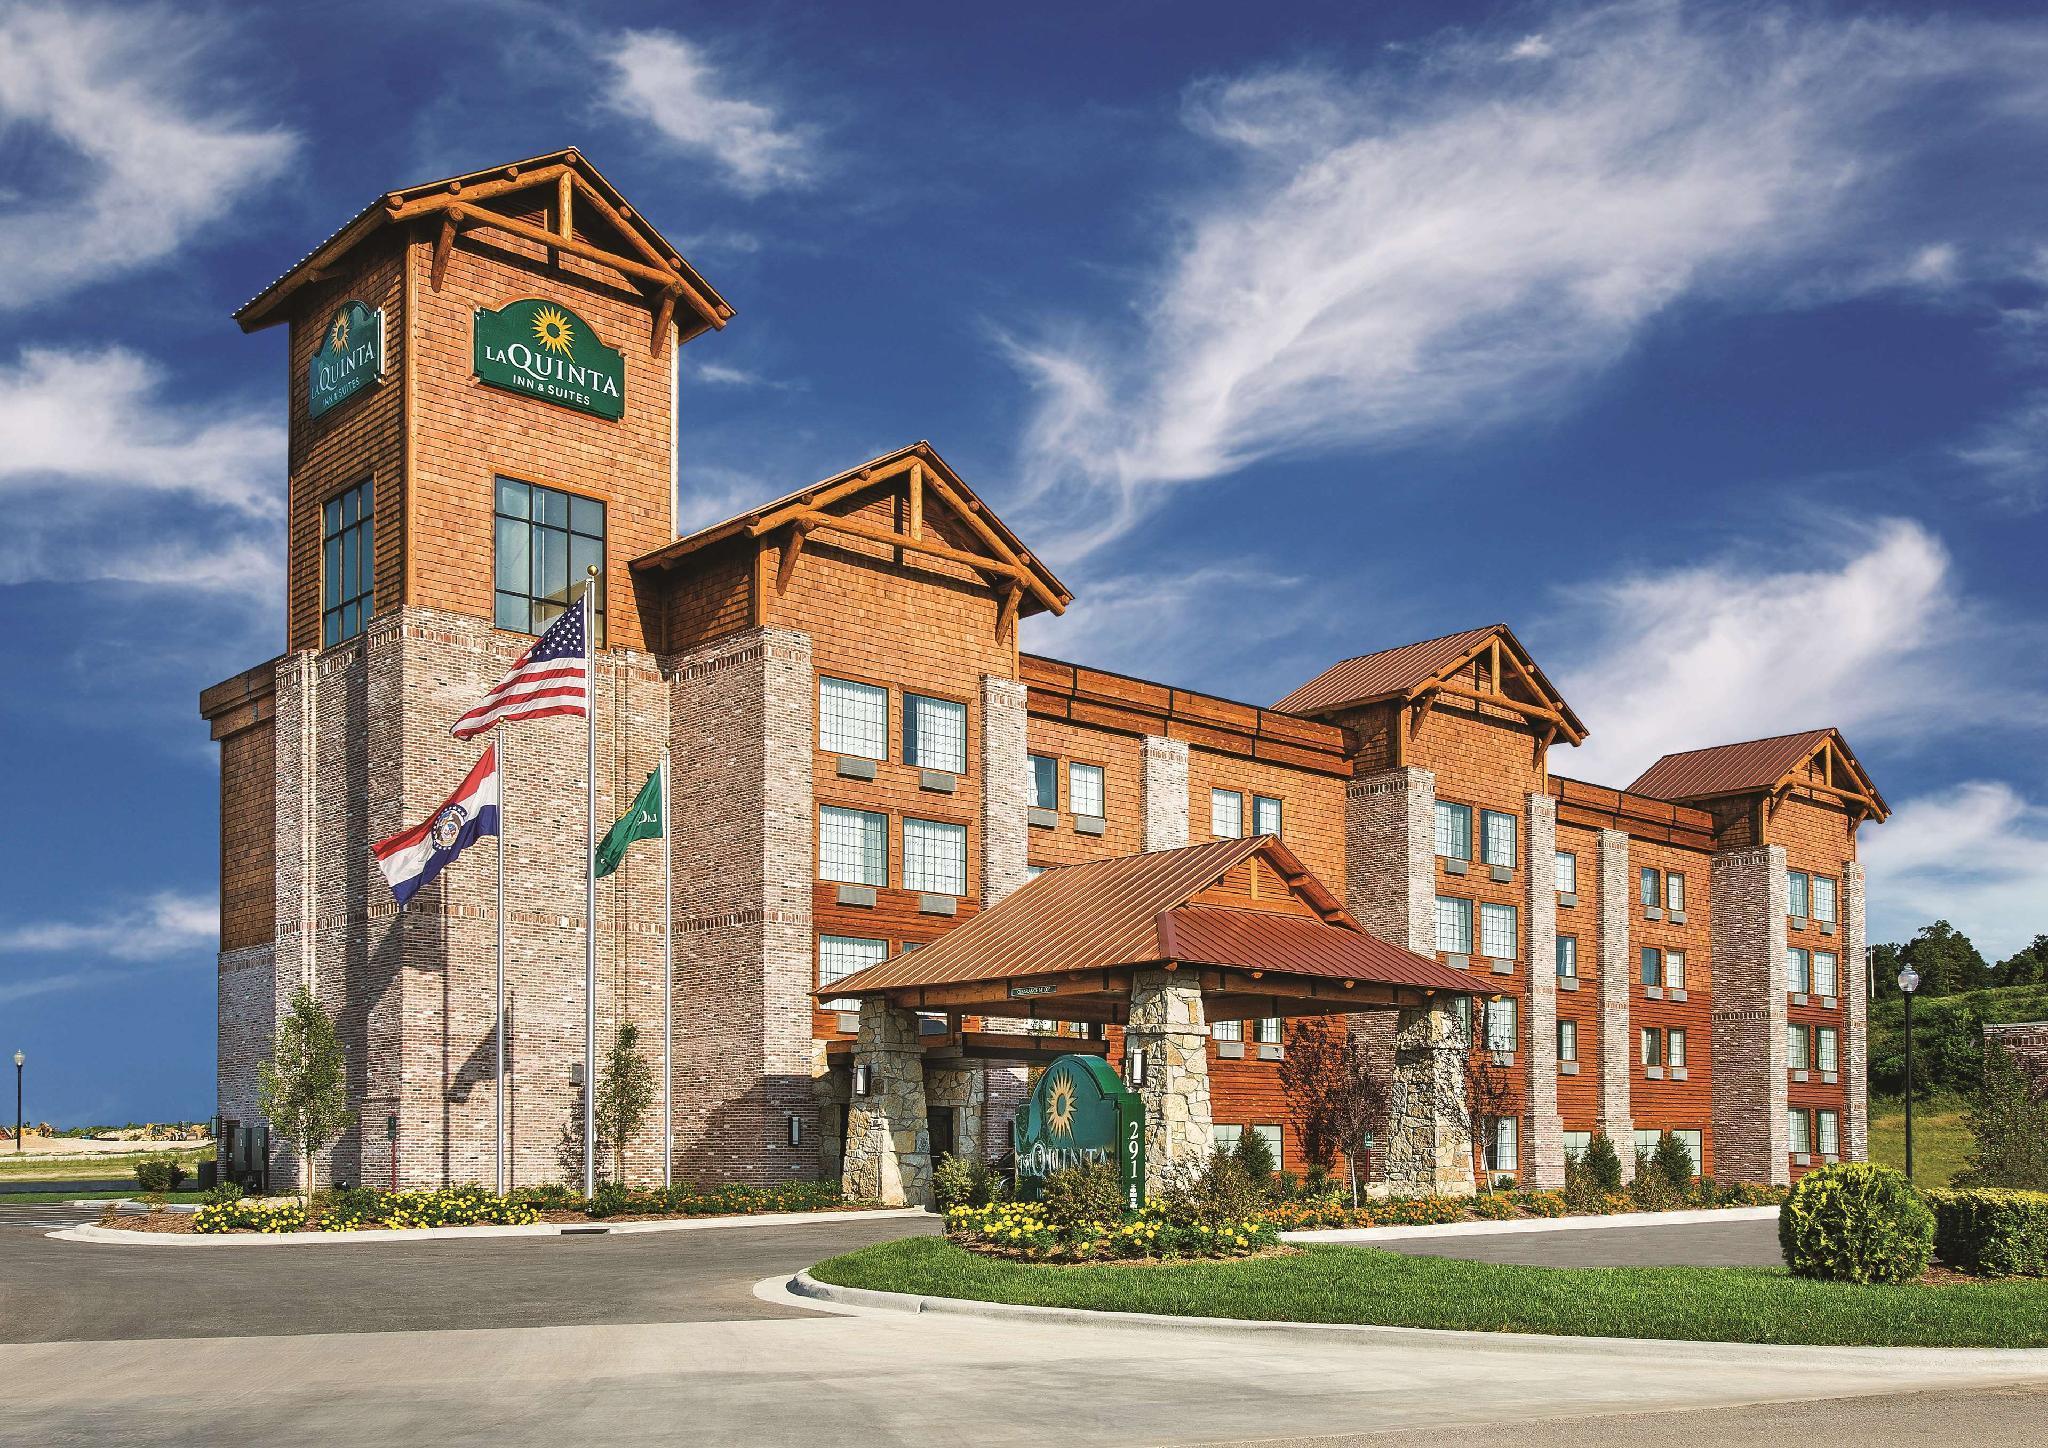 La Quinta Inn And Suites By Wyndham Branson   Hollister